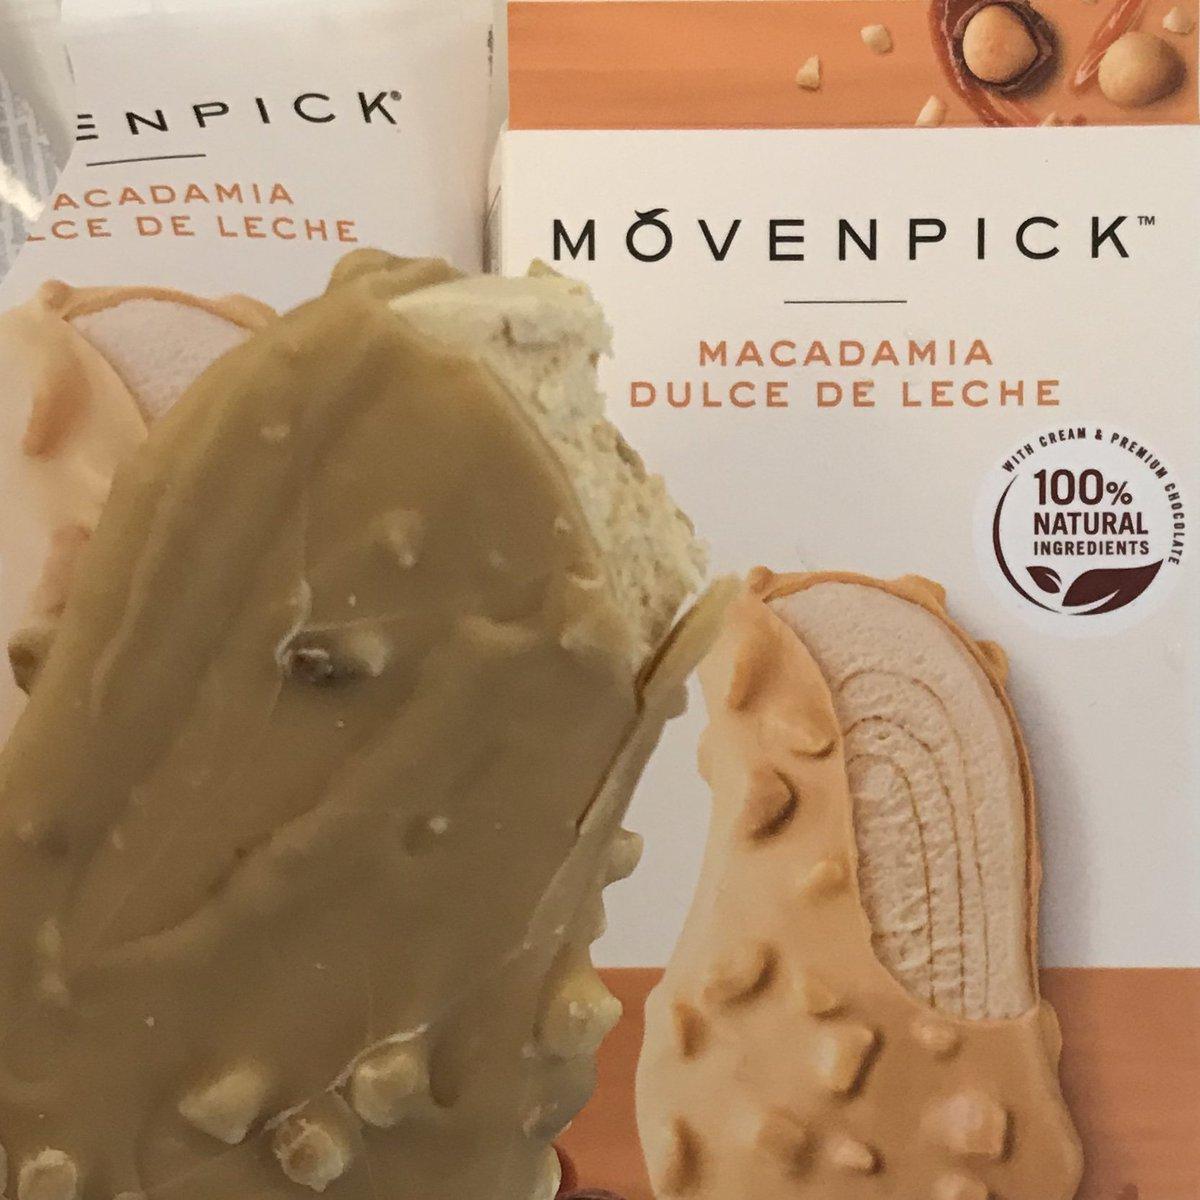 Mövenpick: the art of Swiss ice cream with dulce de leche & macadamia post #hike Wilson trail section 2